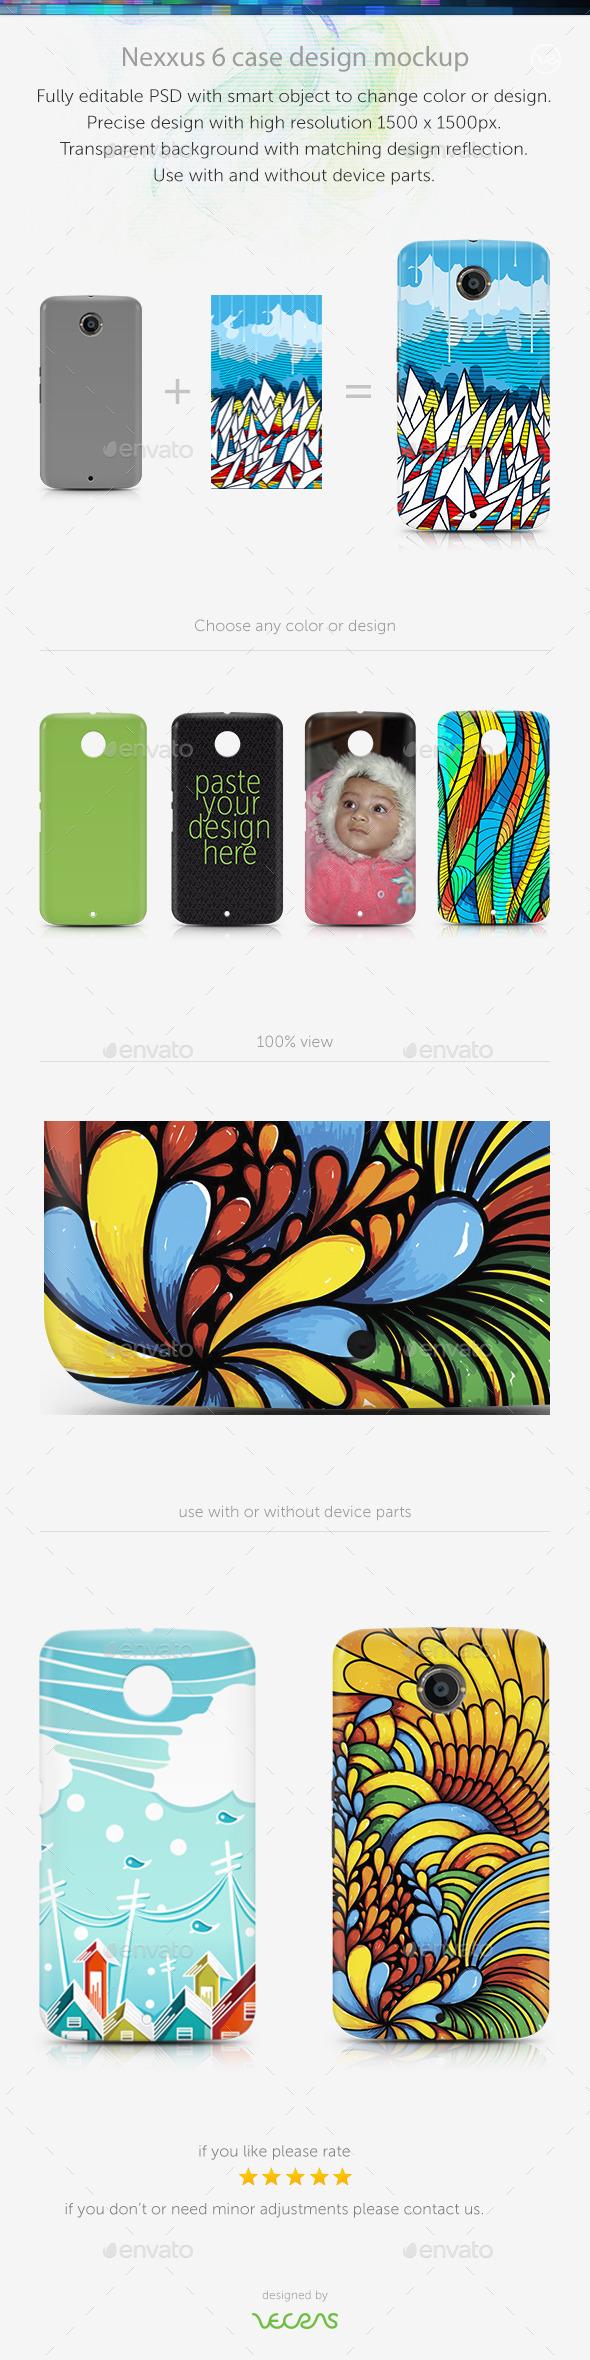 GraphicRiver Nexxus 6 Case Design Mockup 10792795